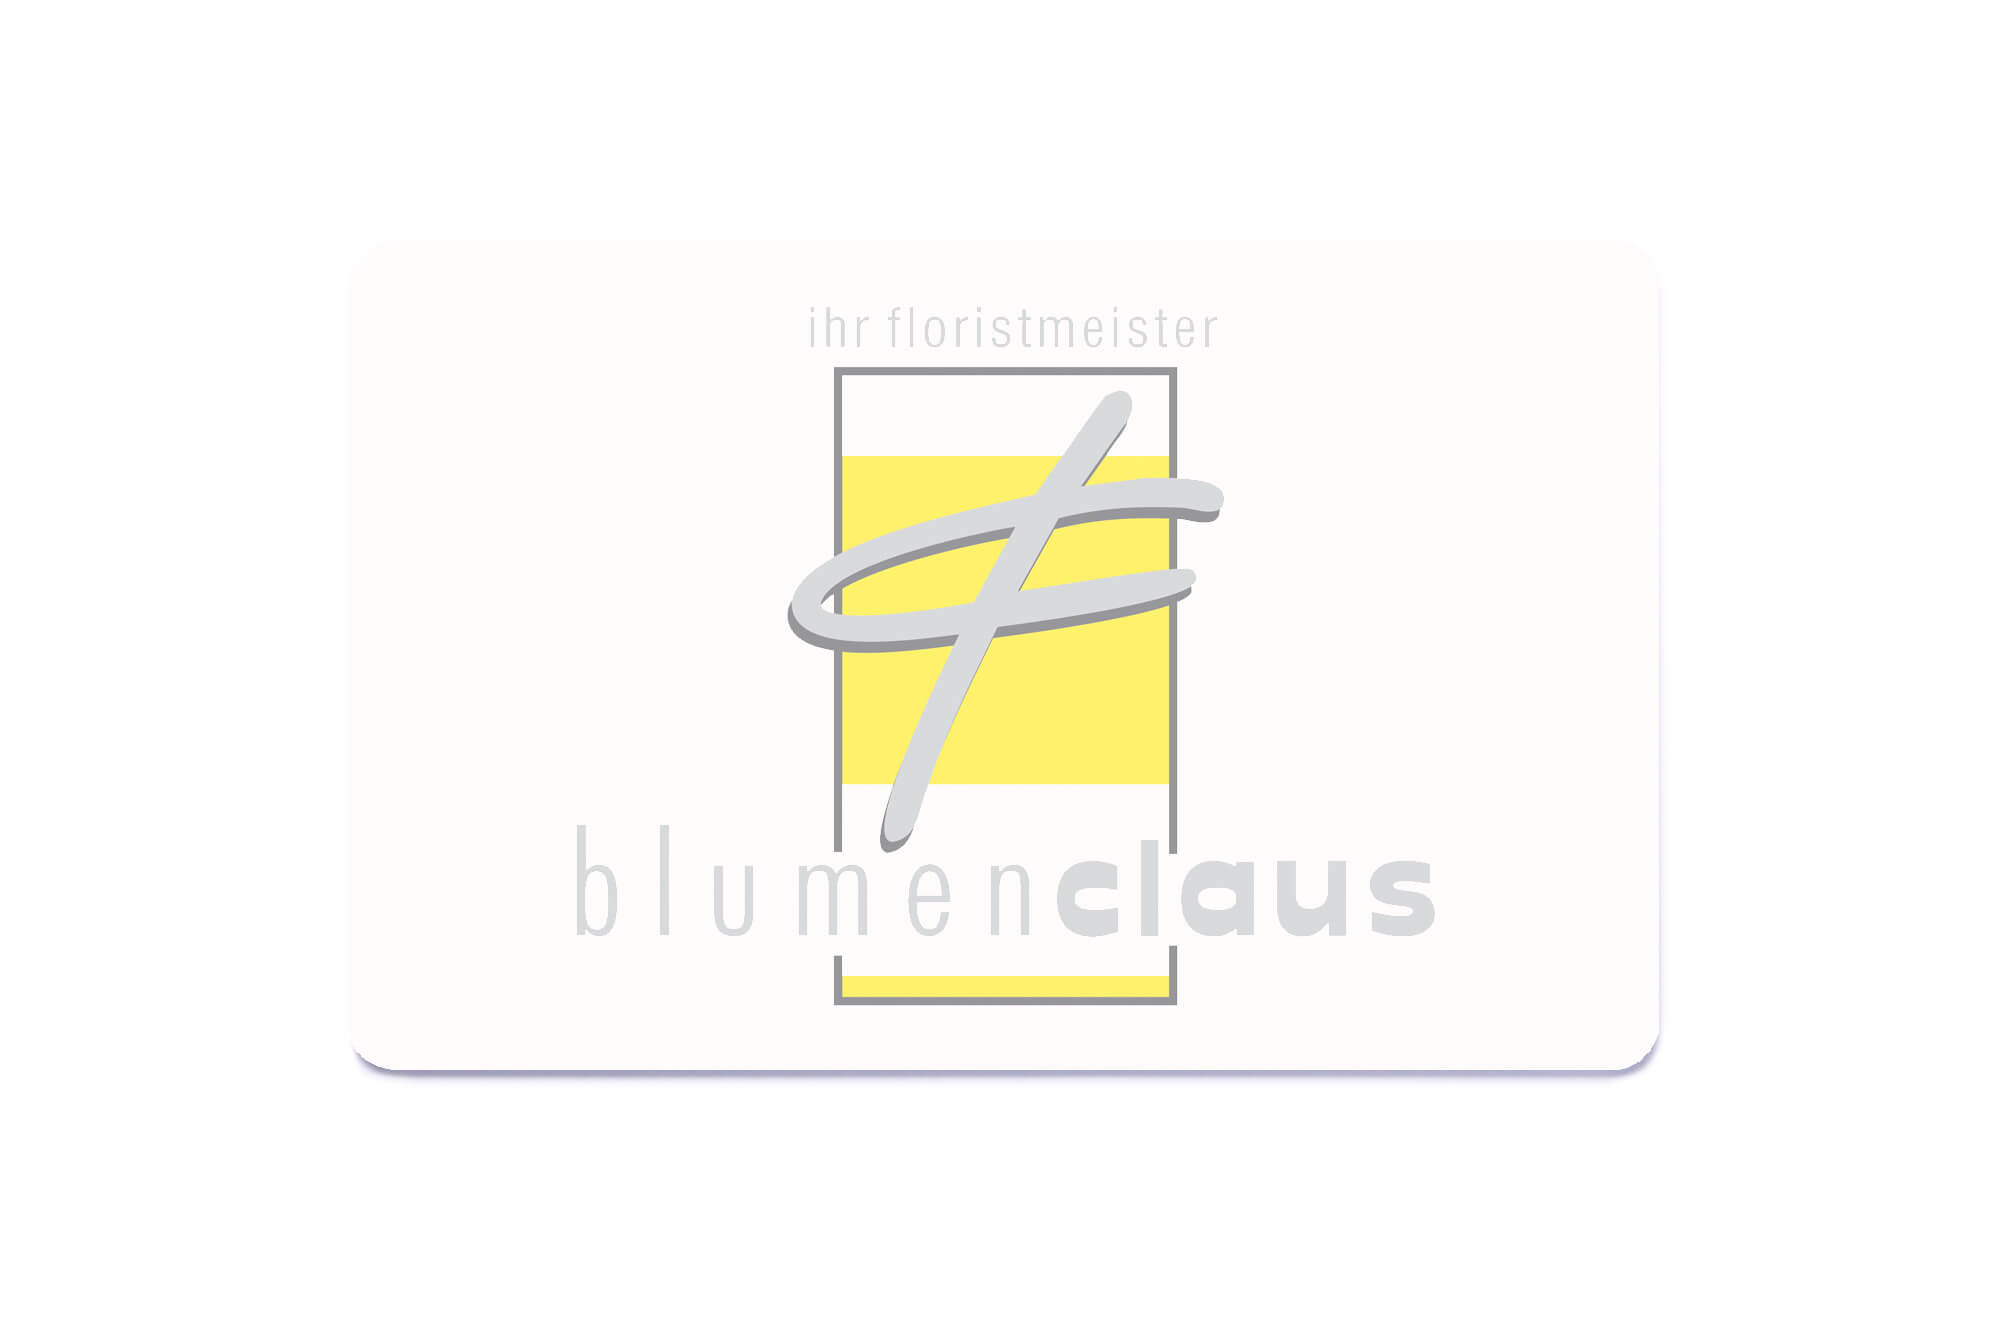 Kundenbindungskarten Blumen Claus